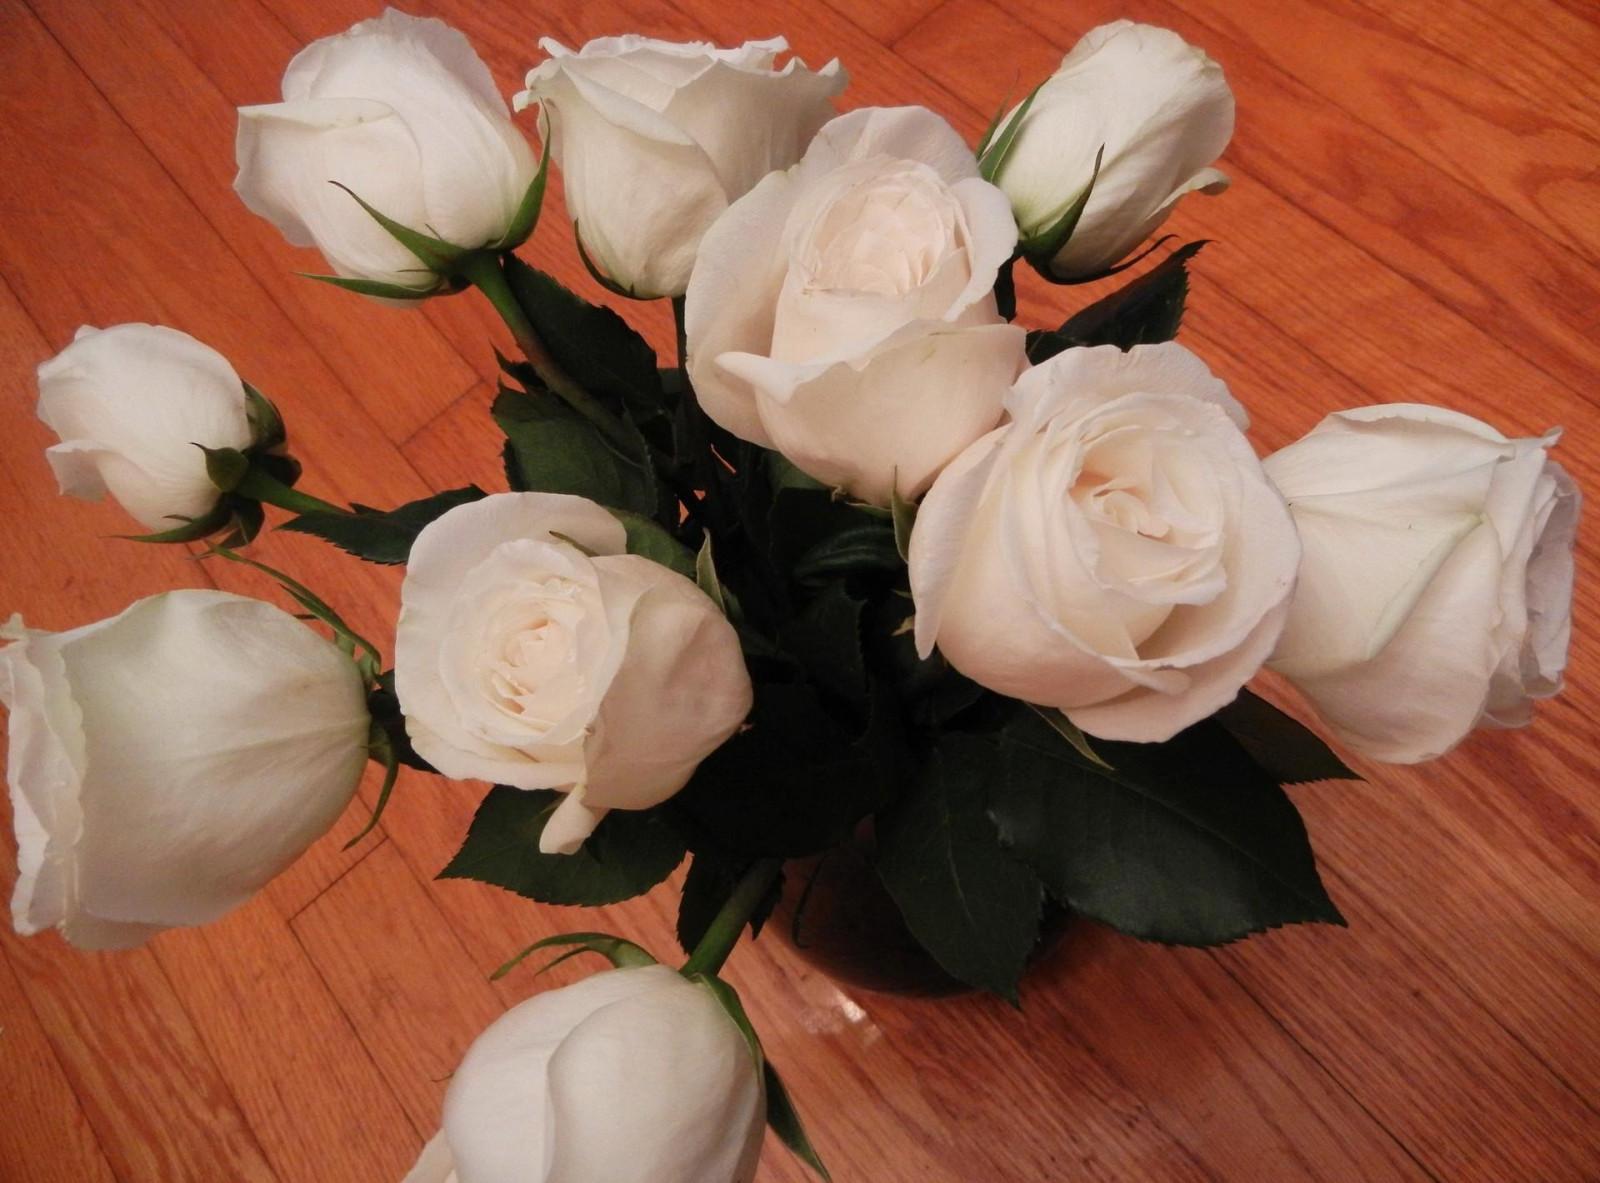 Букет роз на столе в вазе, осенние букеты